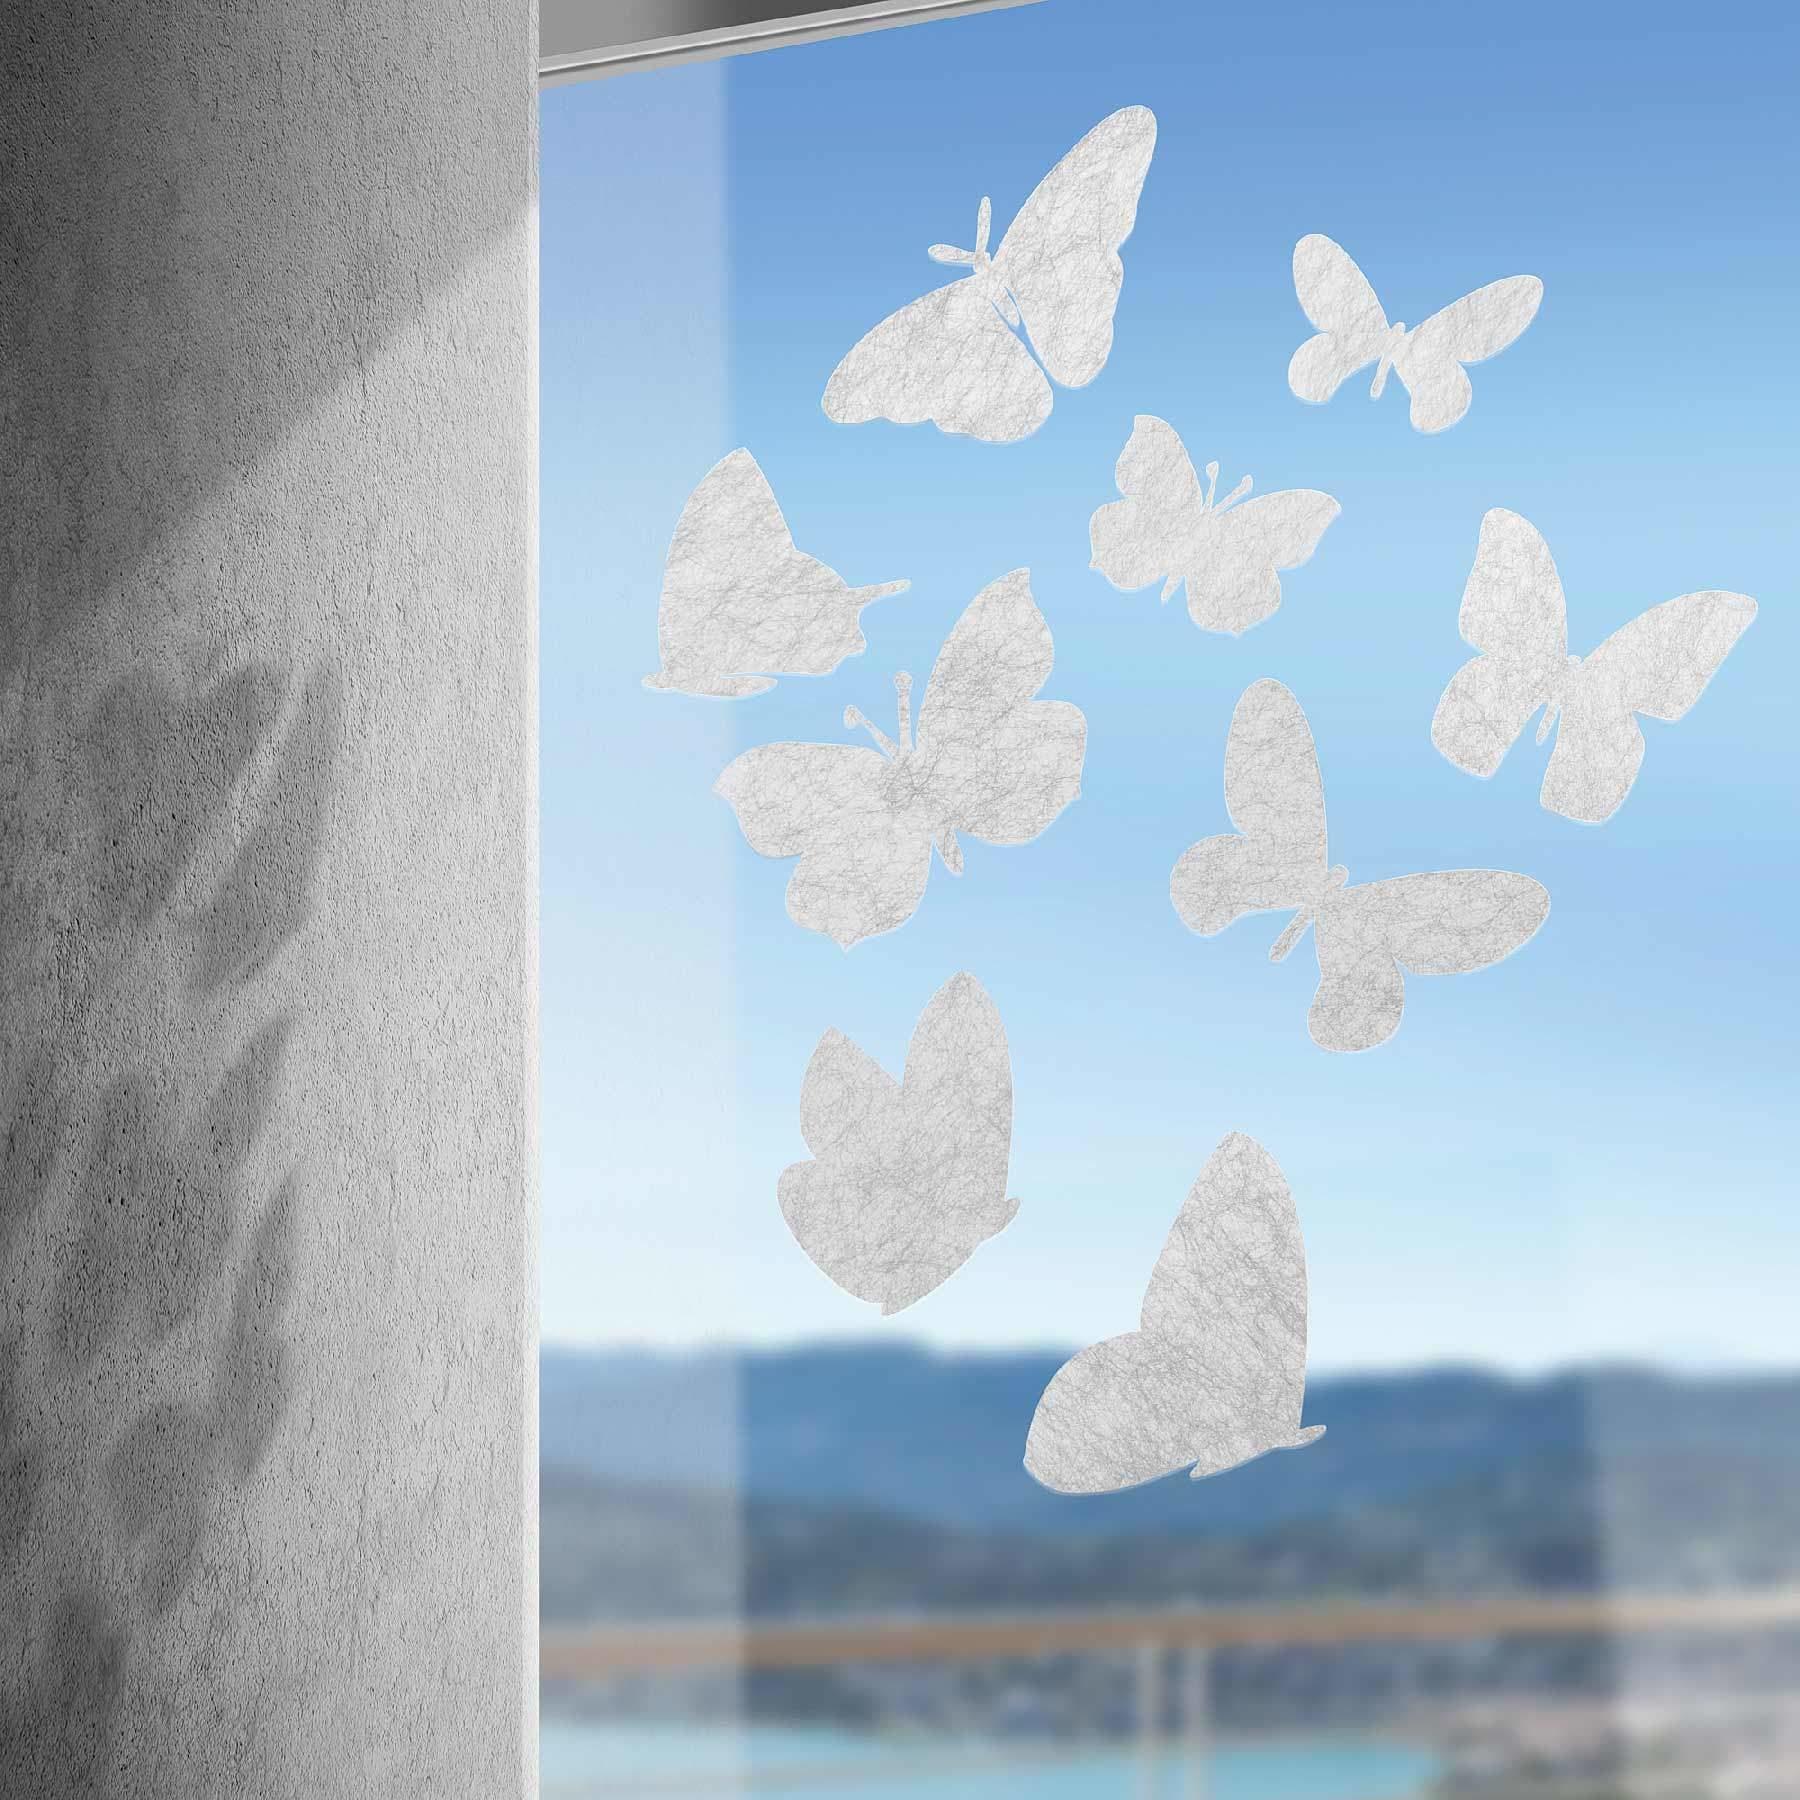 gecko farfalla weiss creation baumann 01 e15324542497112